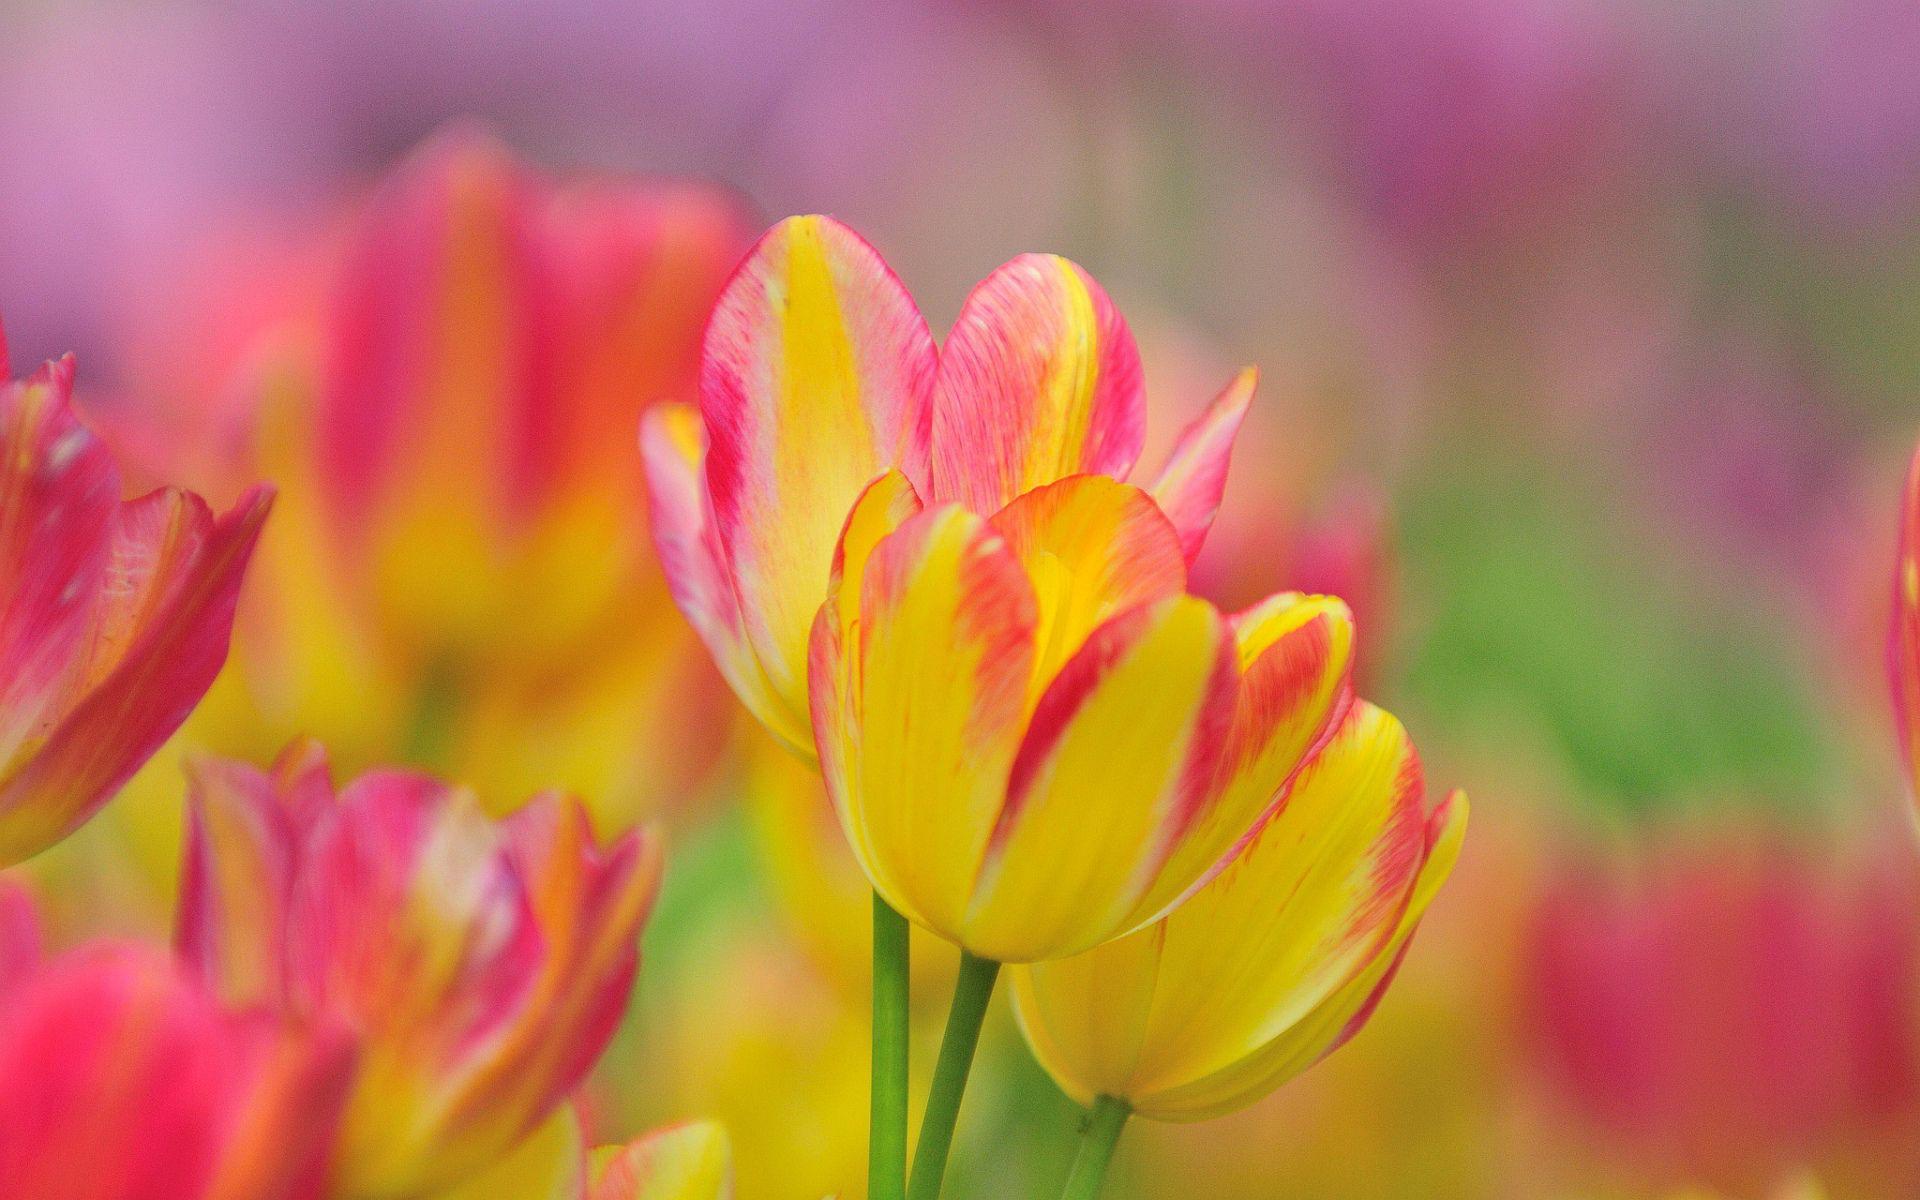 Pink Tulips wallpaper. Pink tulips